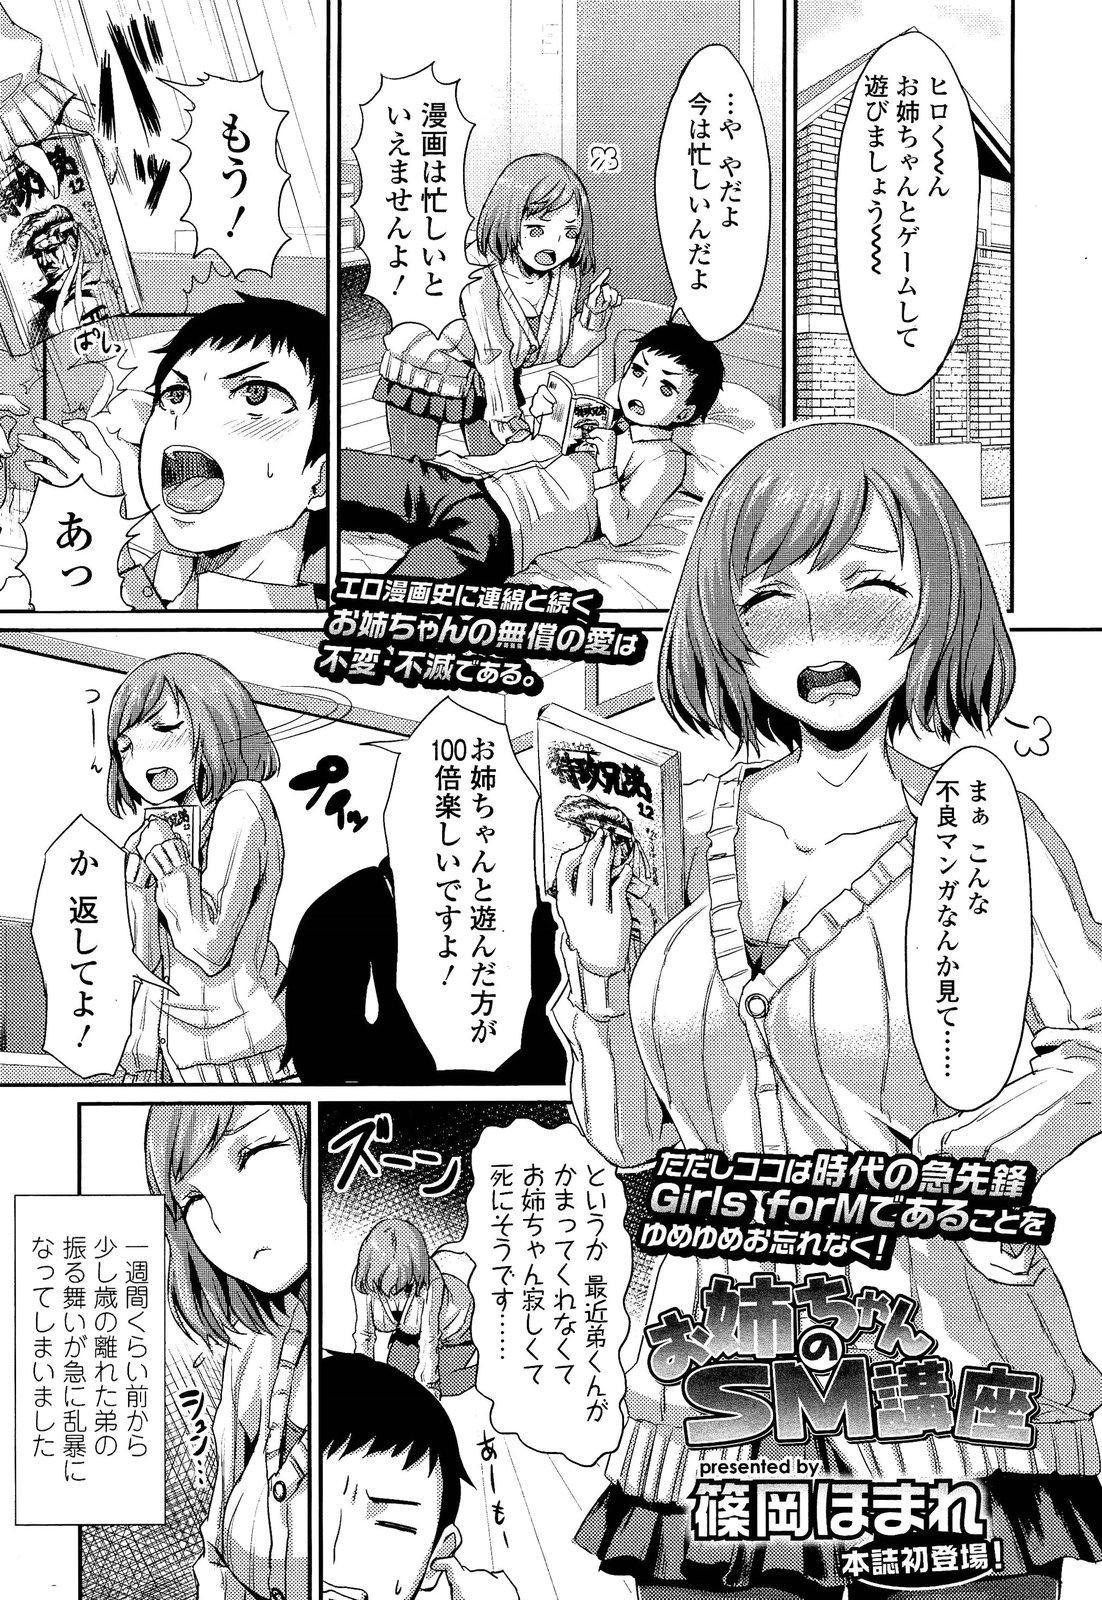 Girls forM Vol. 02 162